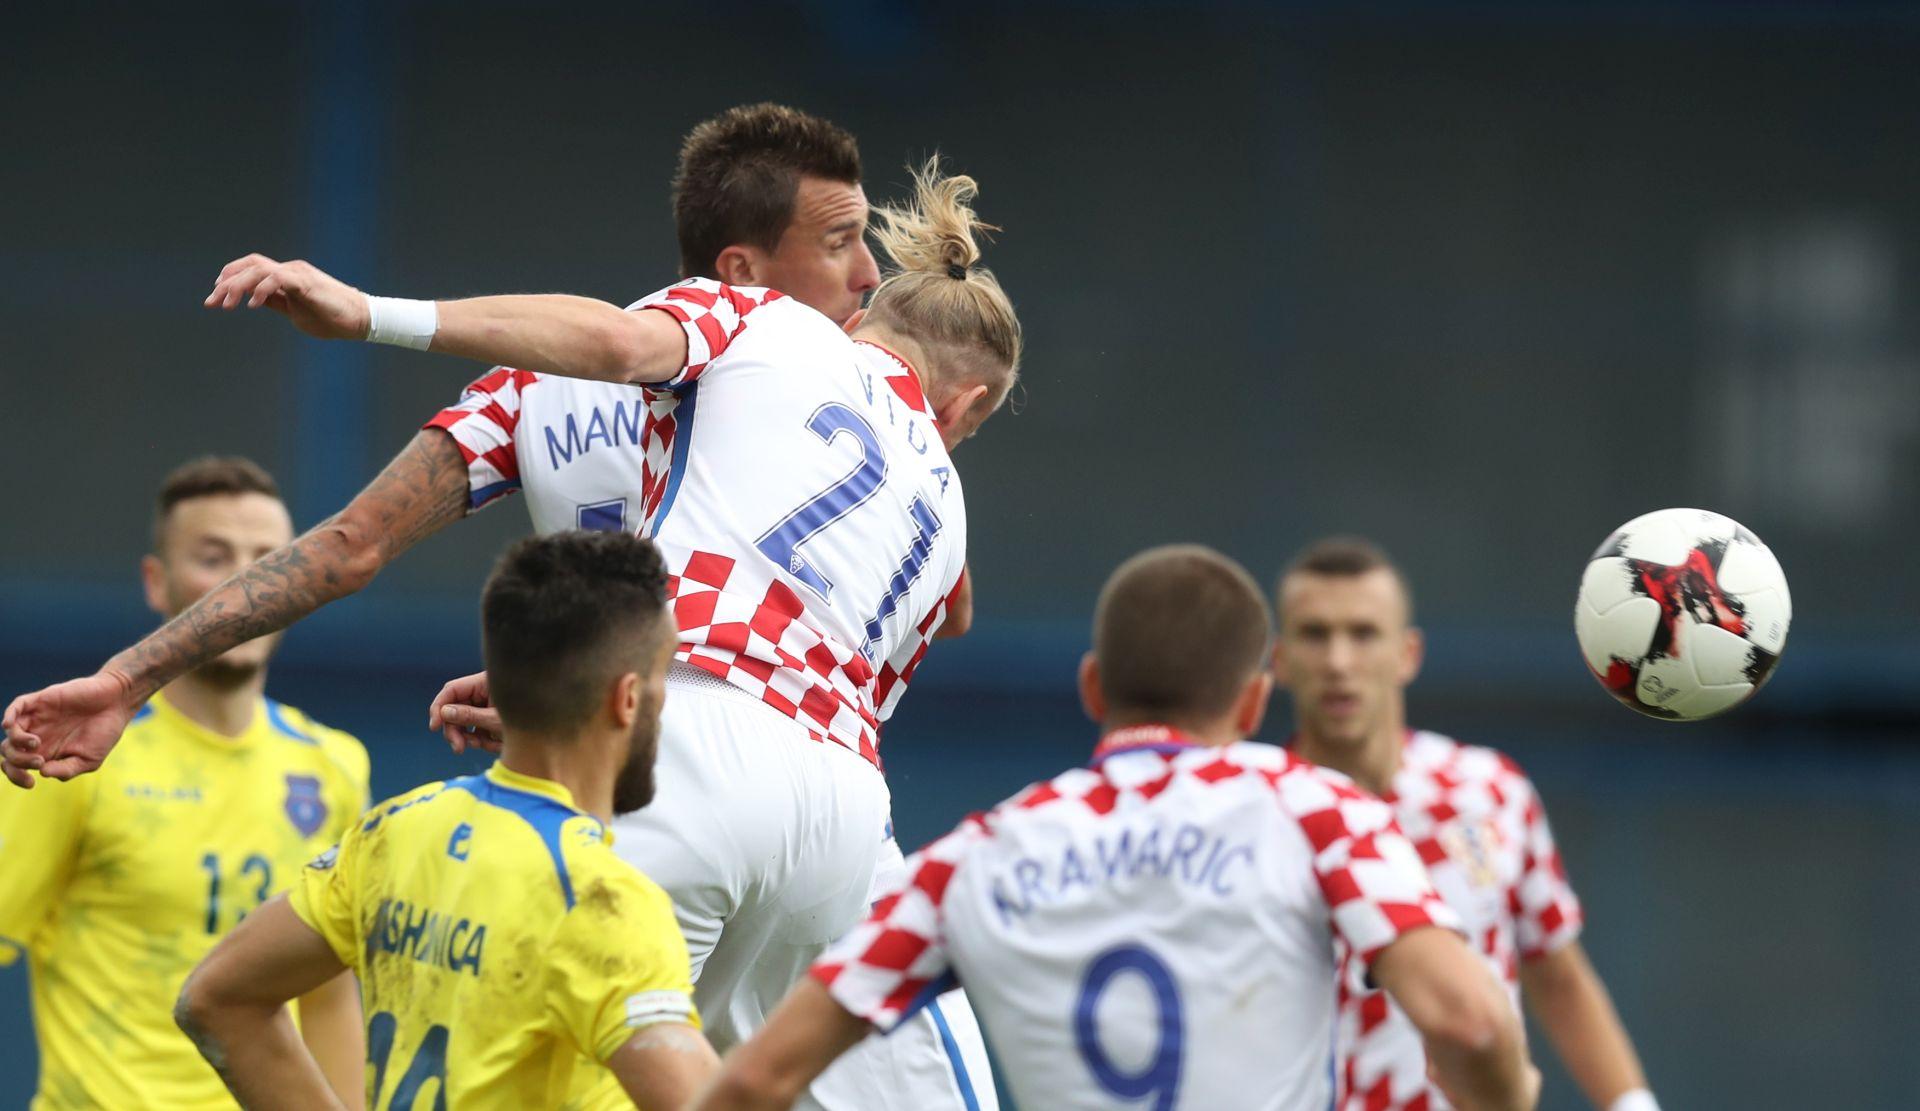 PRAVI SPARING PARTNER Hrvatska protiv Perua u ožujku?